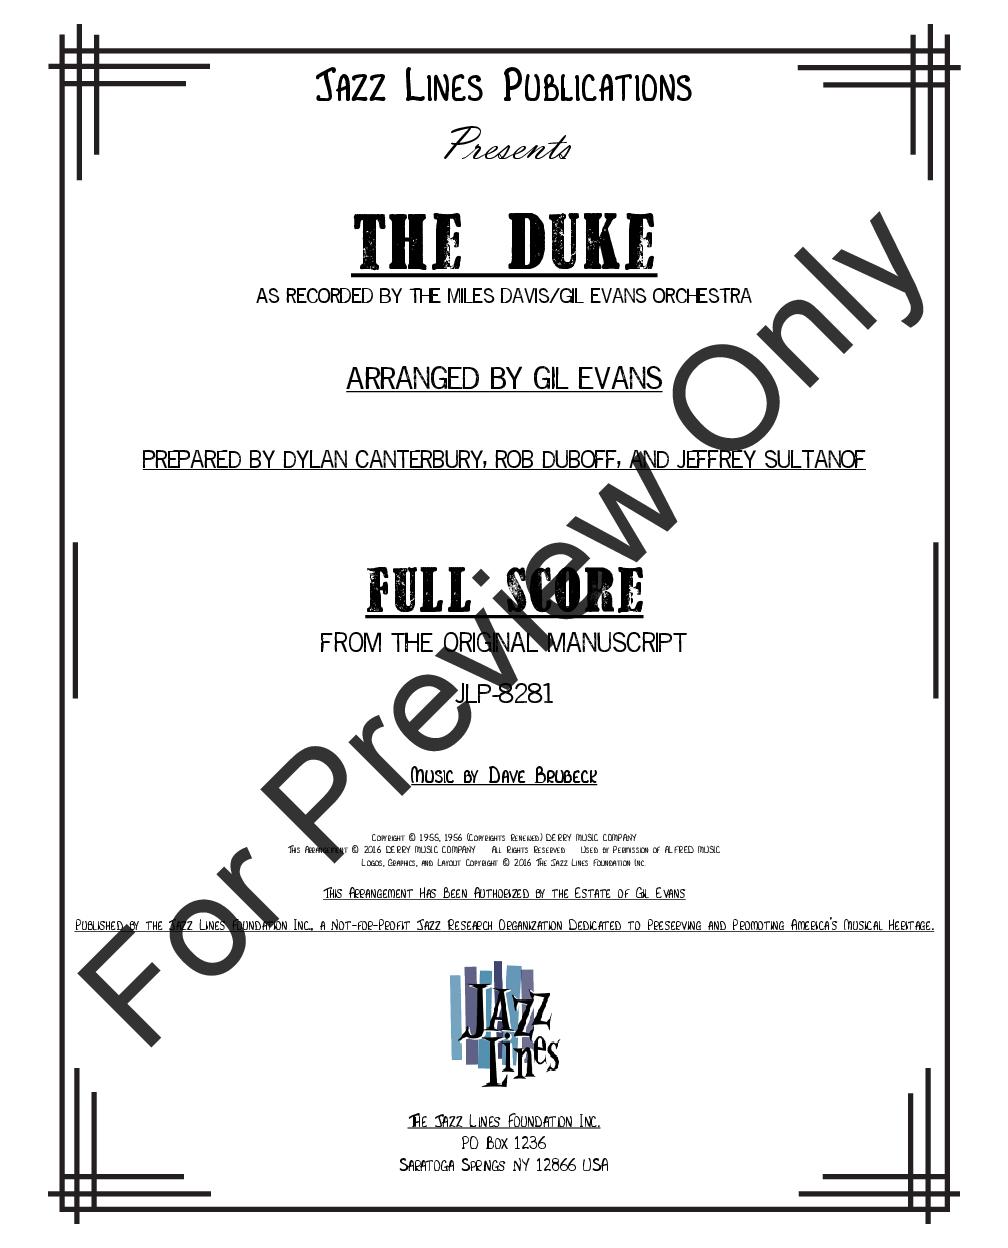 The Duke by Dave Brubeck/arr  Gil Evans  J W  Pepper Sheet Music